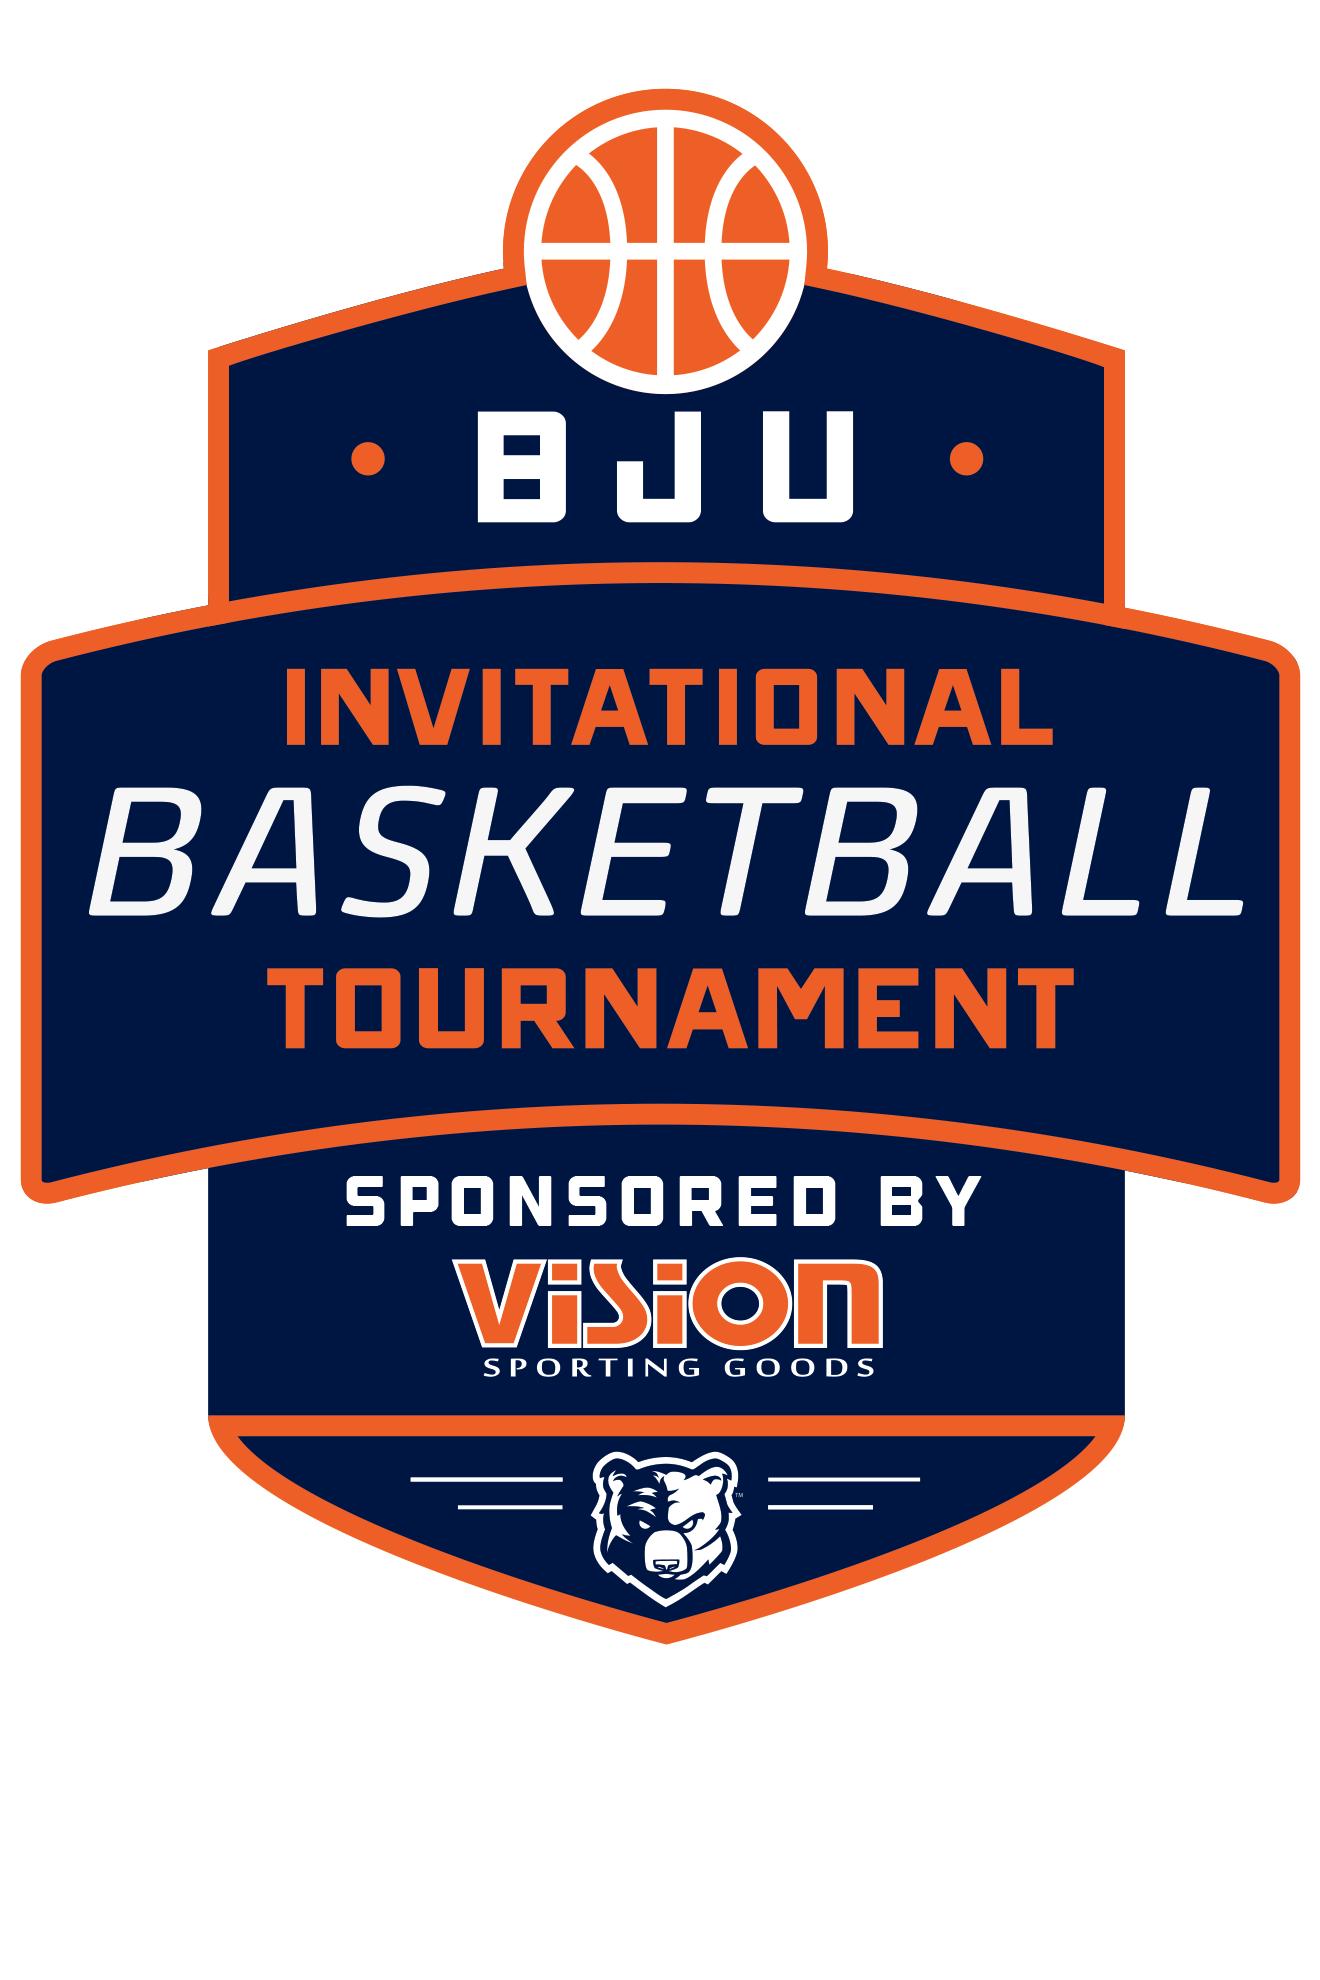 Jan. 29 2016 Invitational Basketball Tournament Championship on Livestream